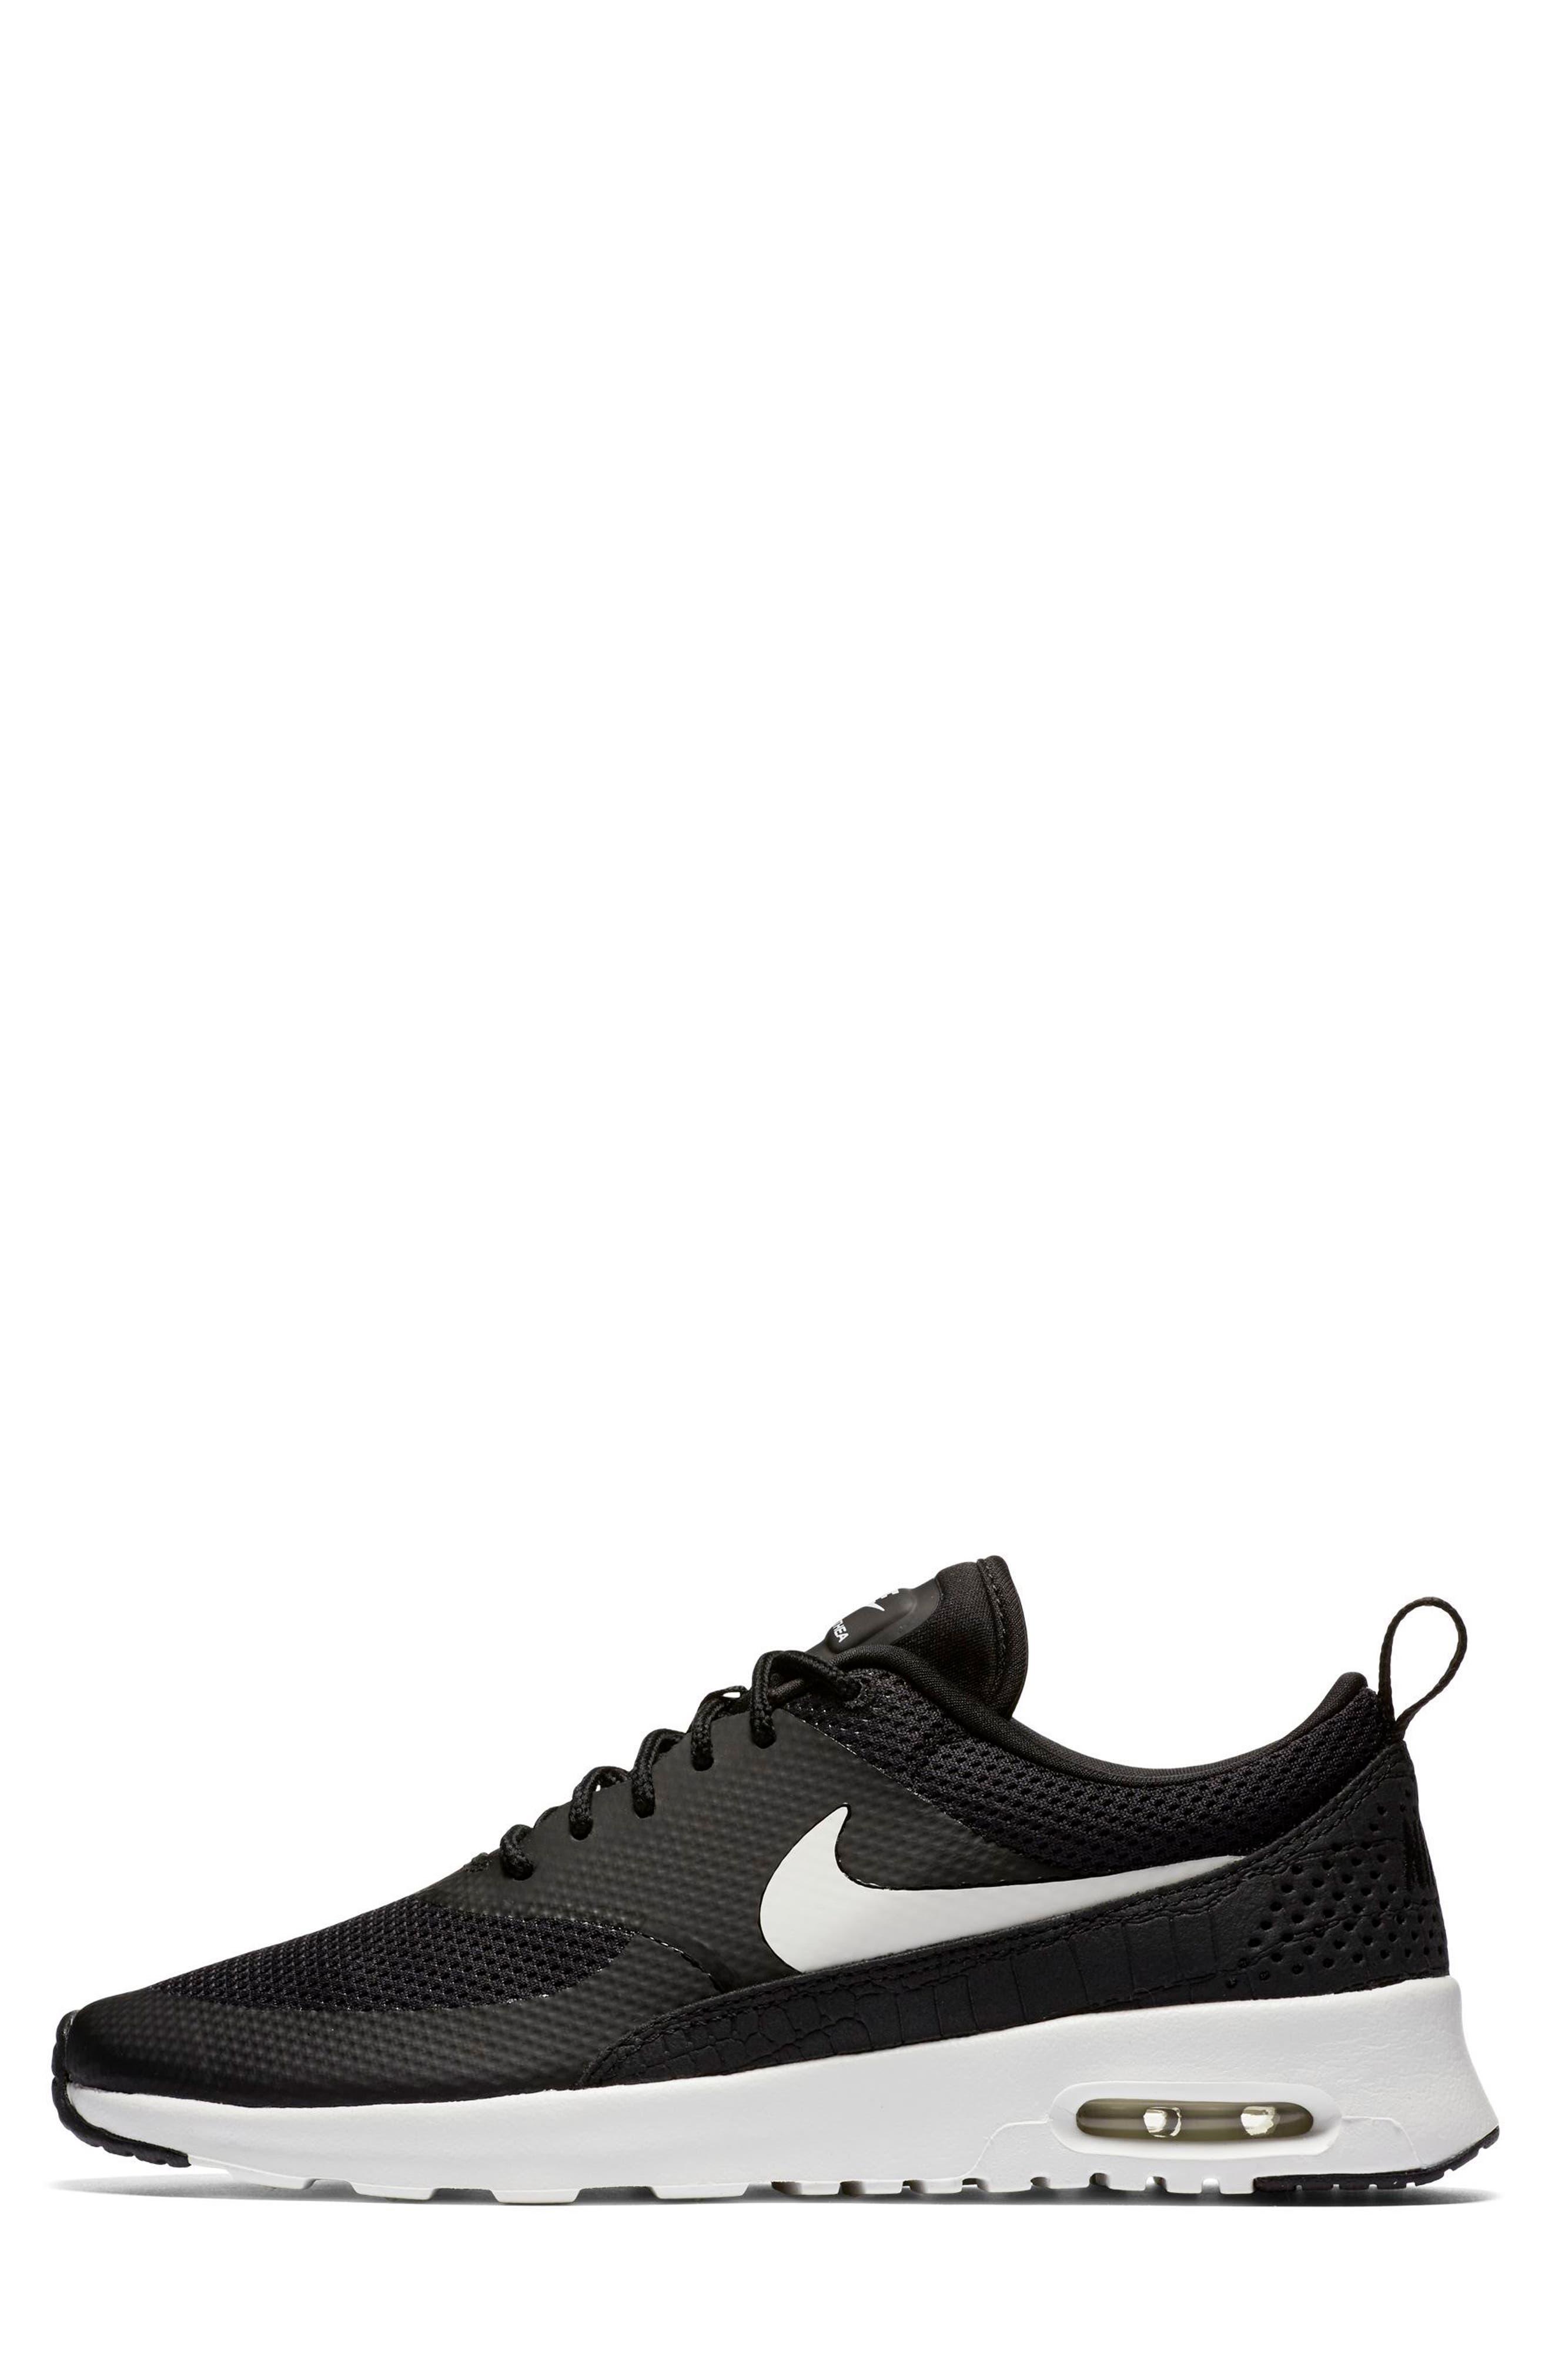 Air Max Thea Sneaker,                             Alternate thumbnail 3, color,                             020